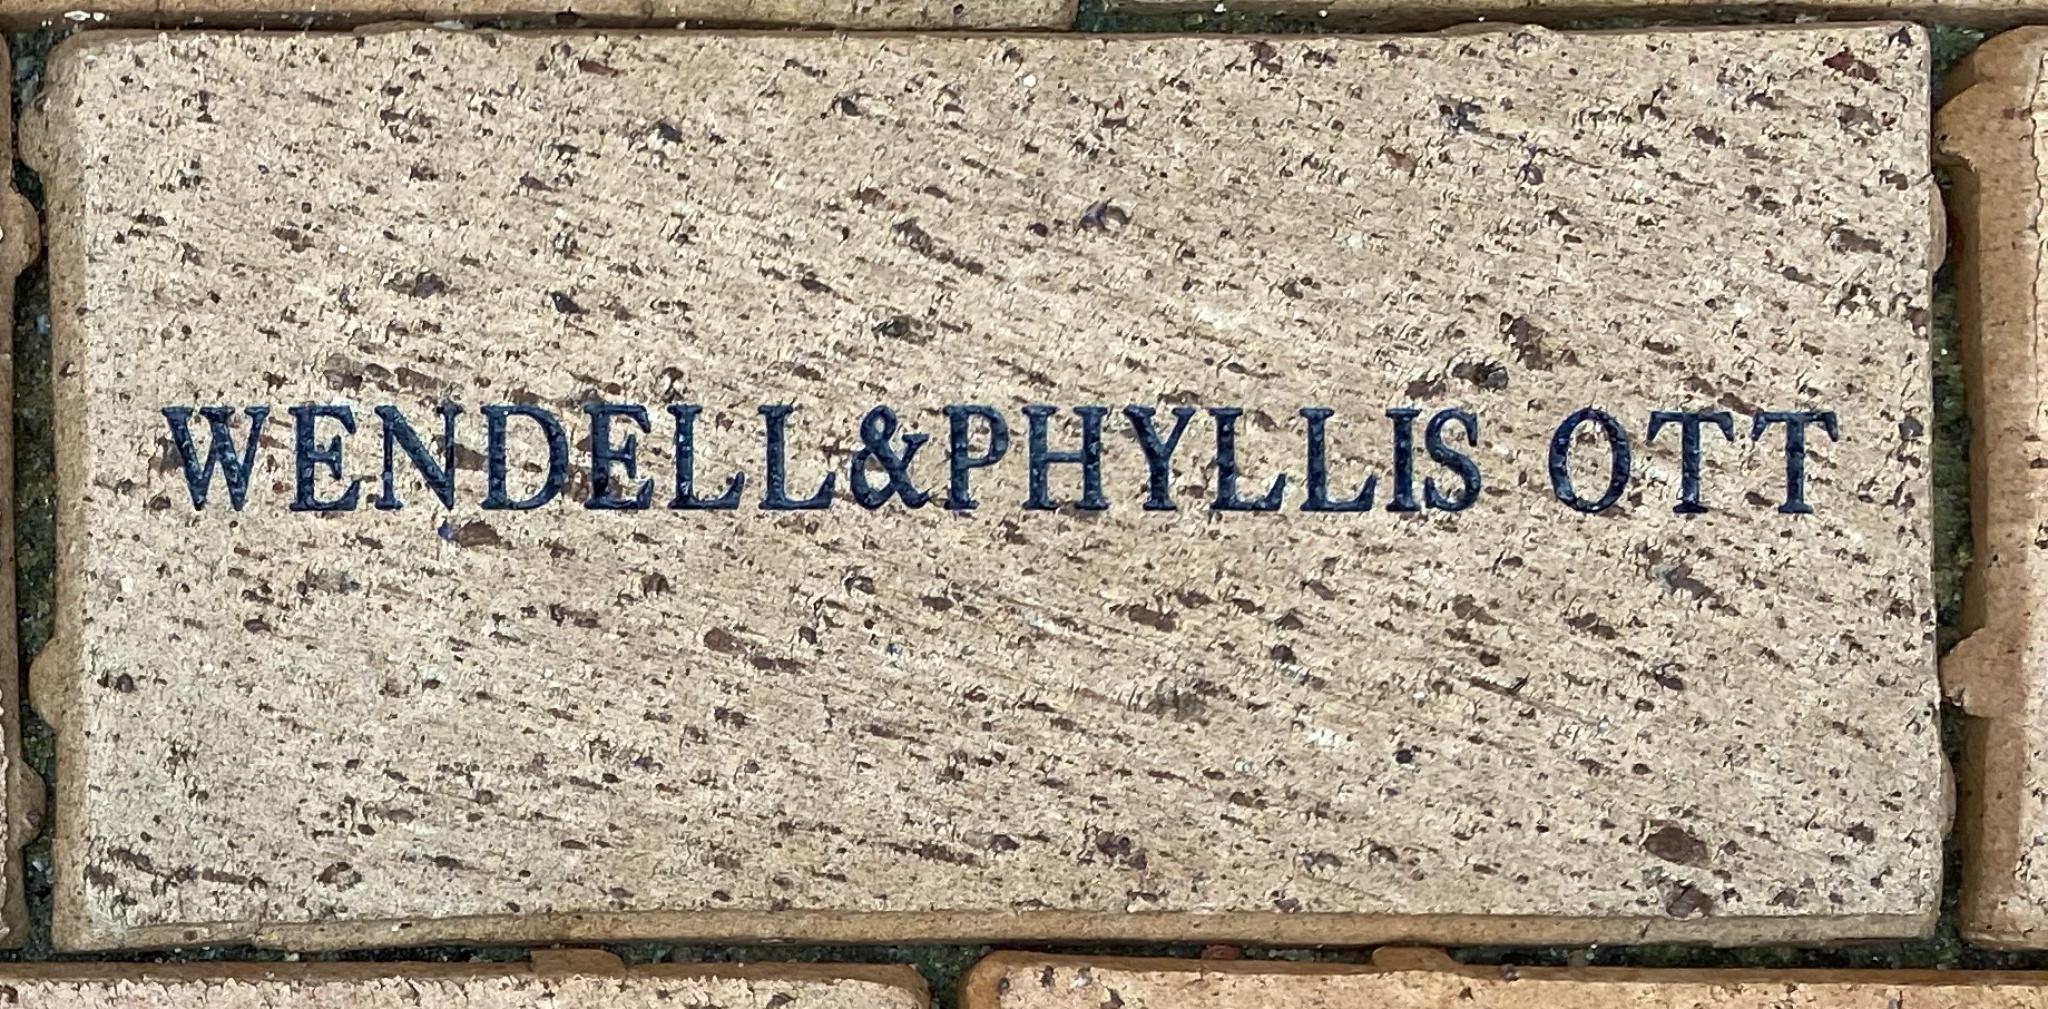 WENDELL&PHYLLIS OTT